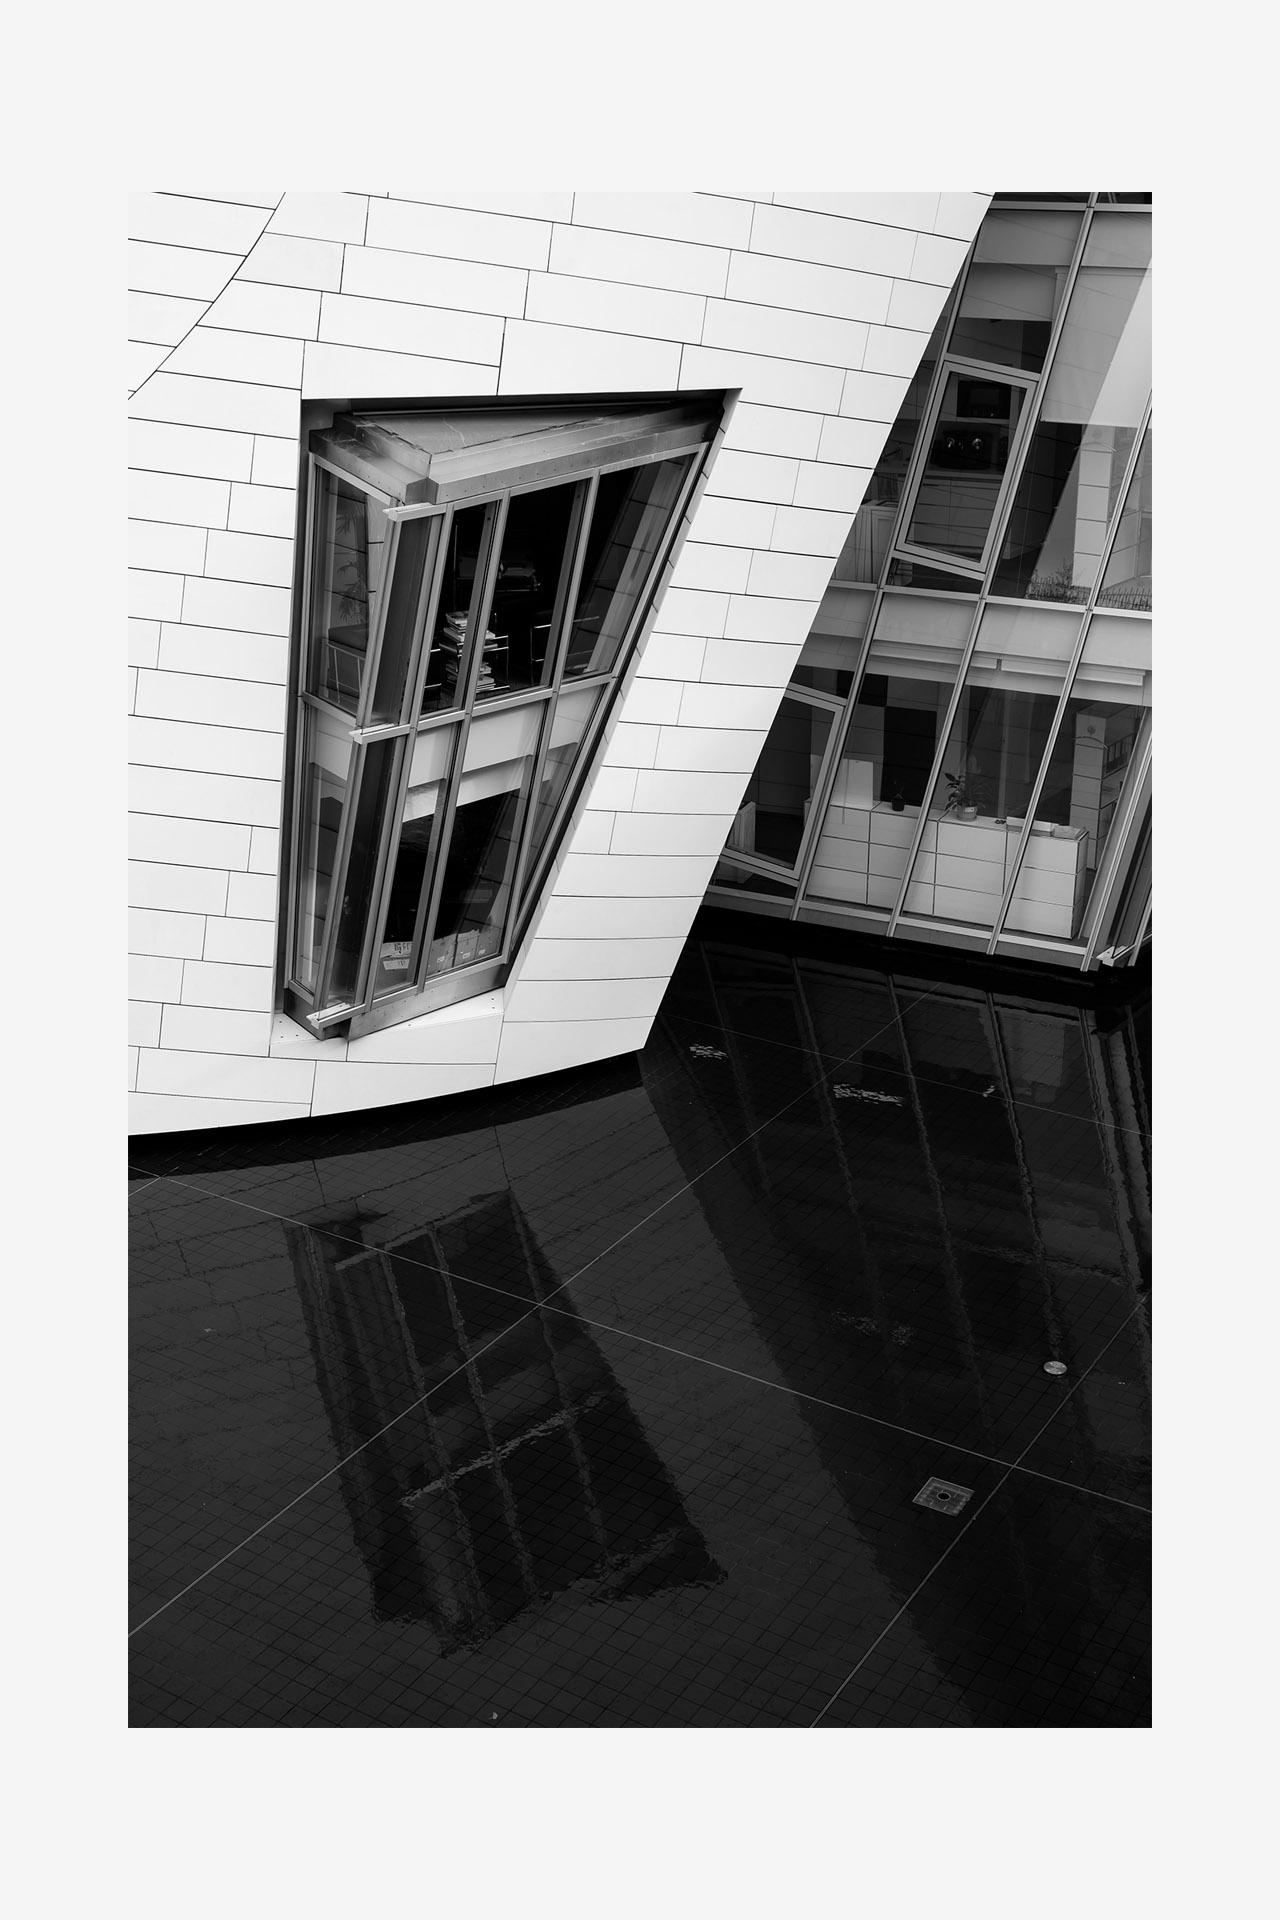 fondation-louis-vuitton-06B